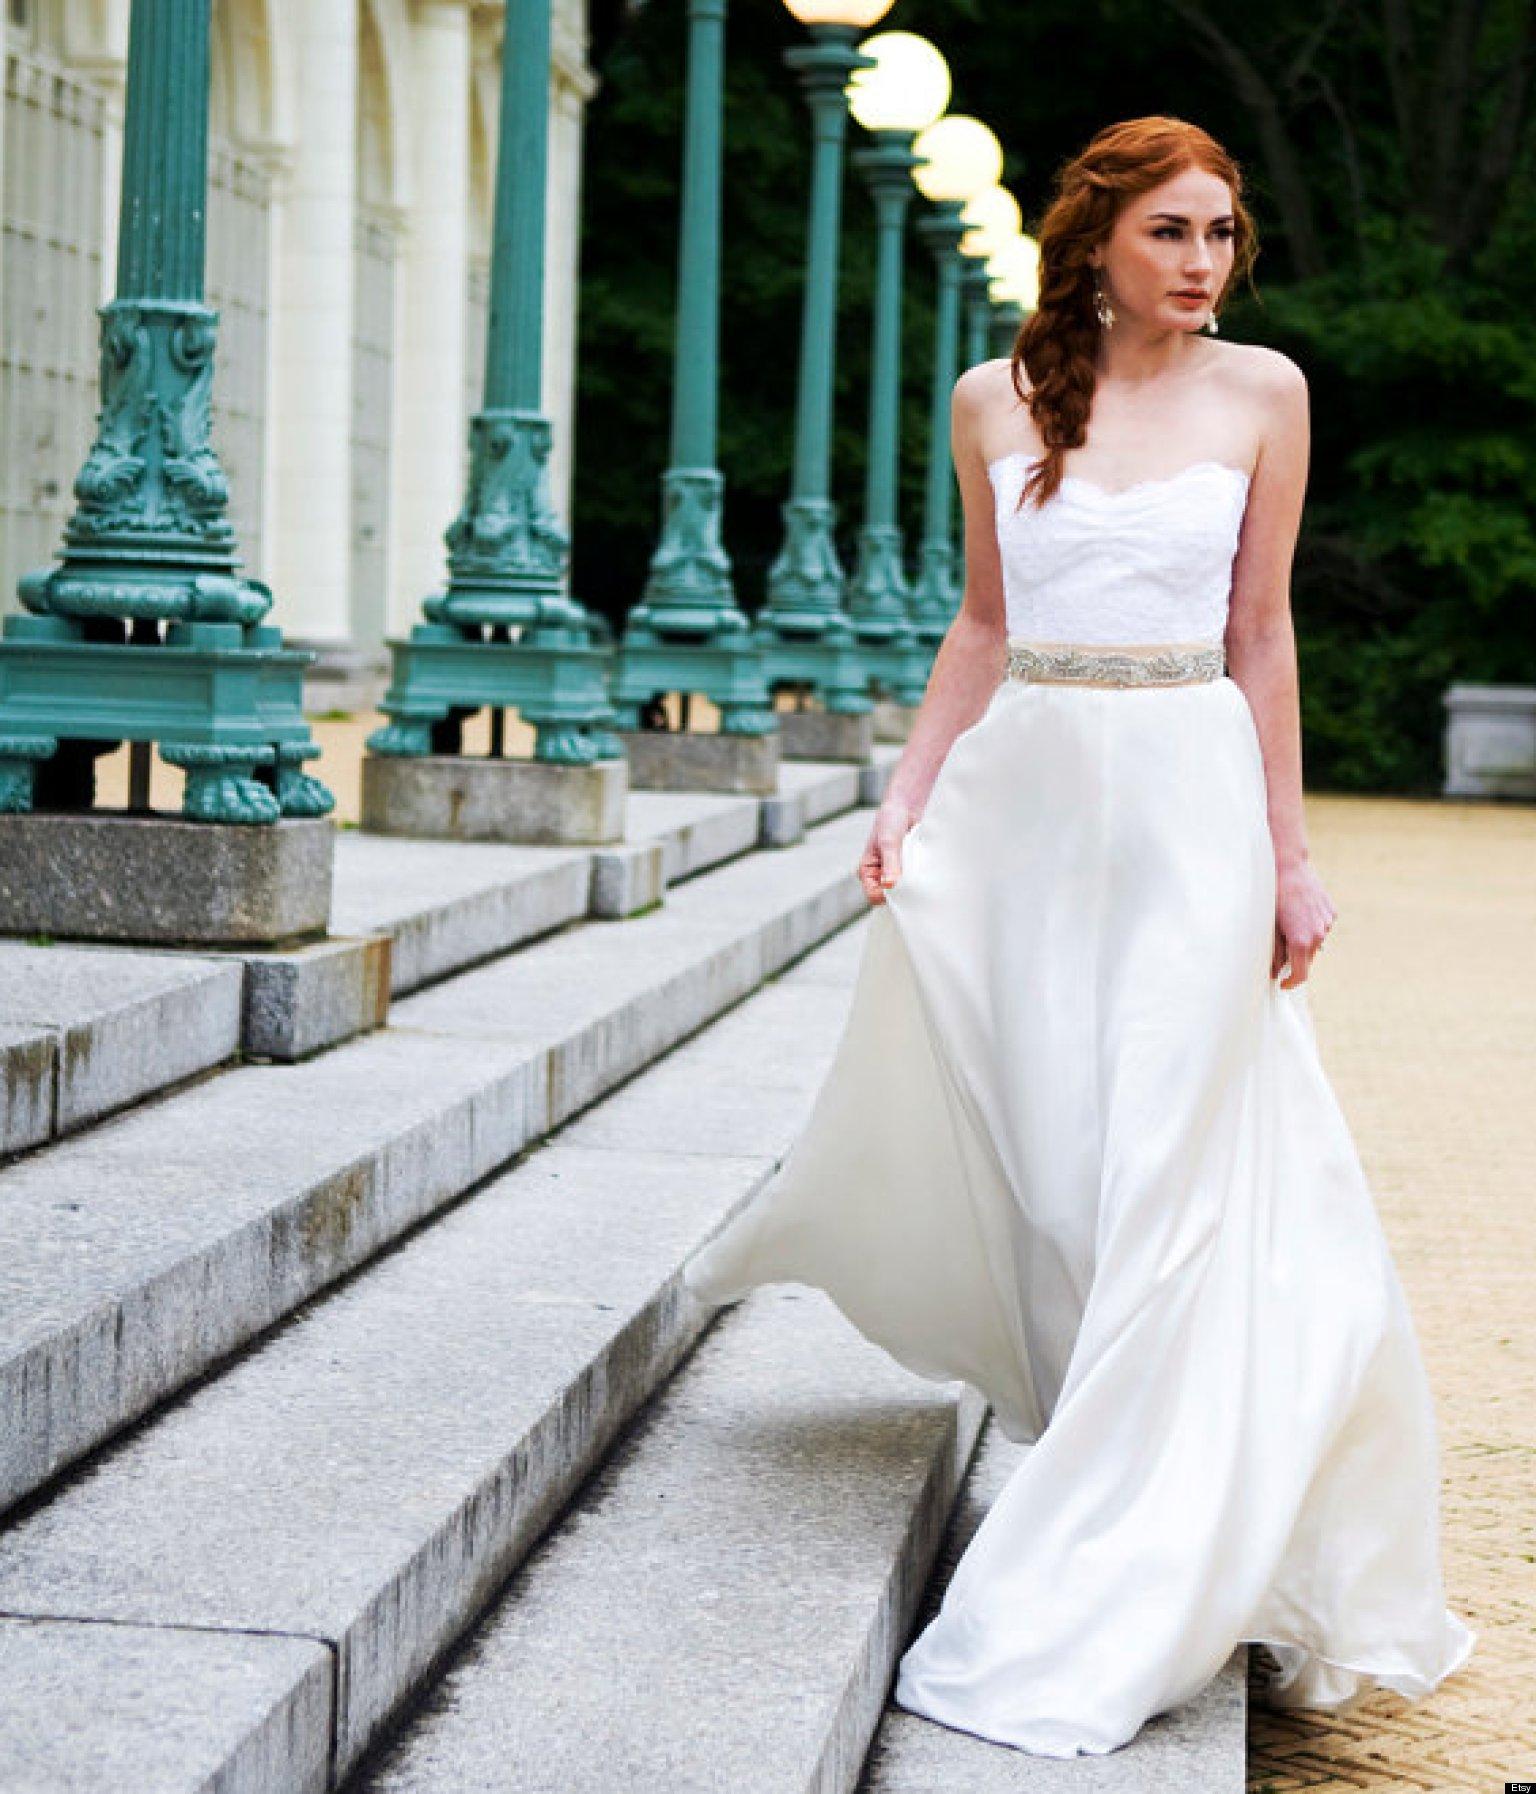 40 Unique Wedding Dresses You Can Buy Online